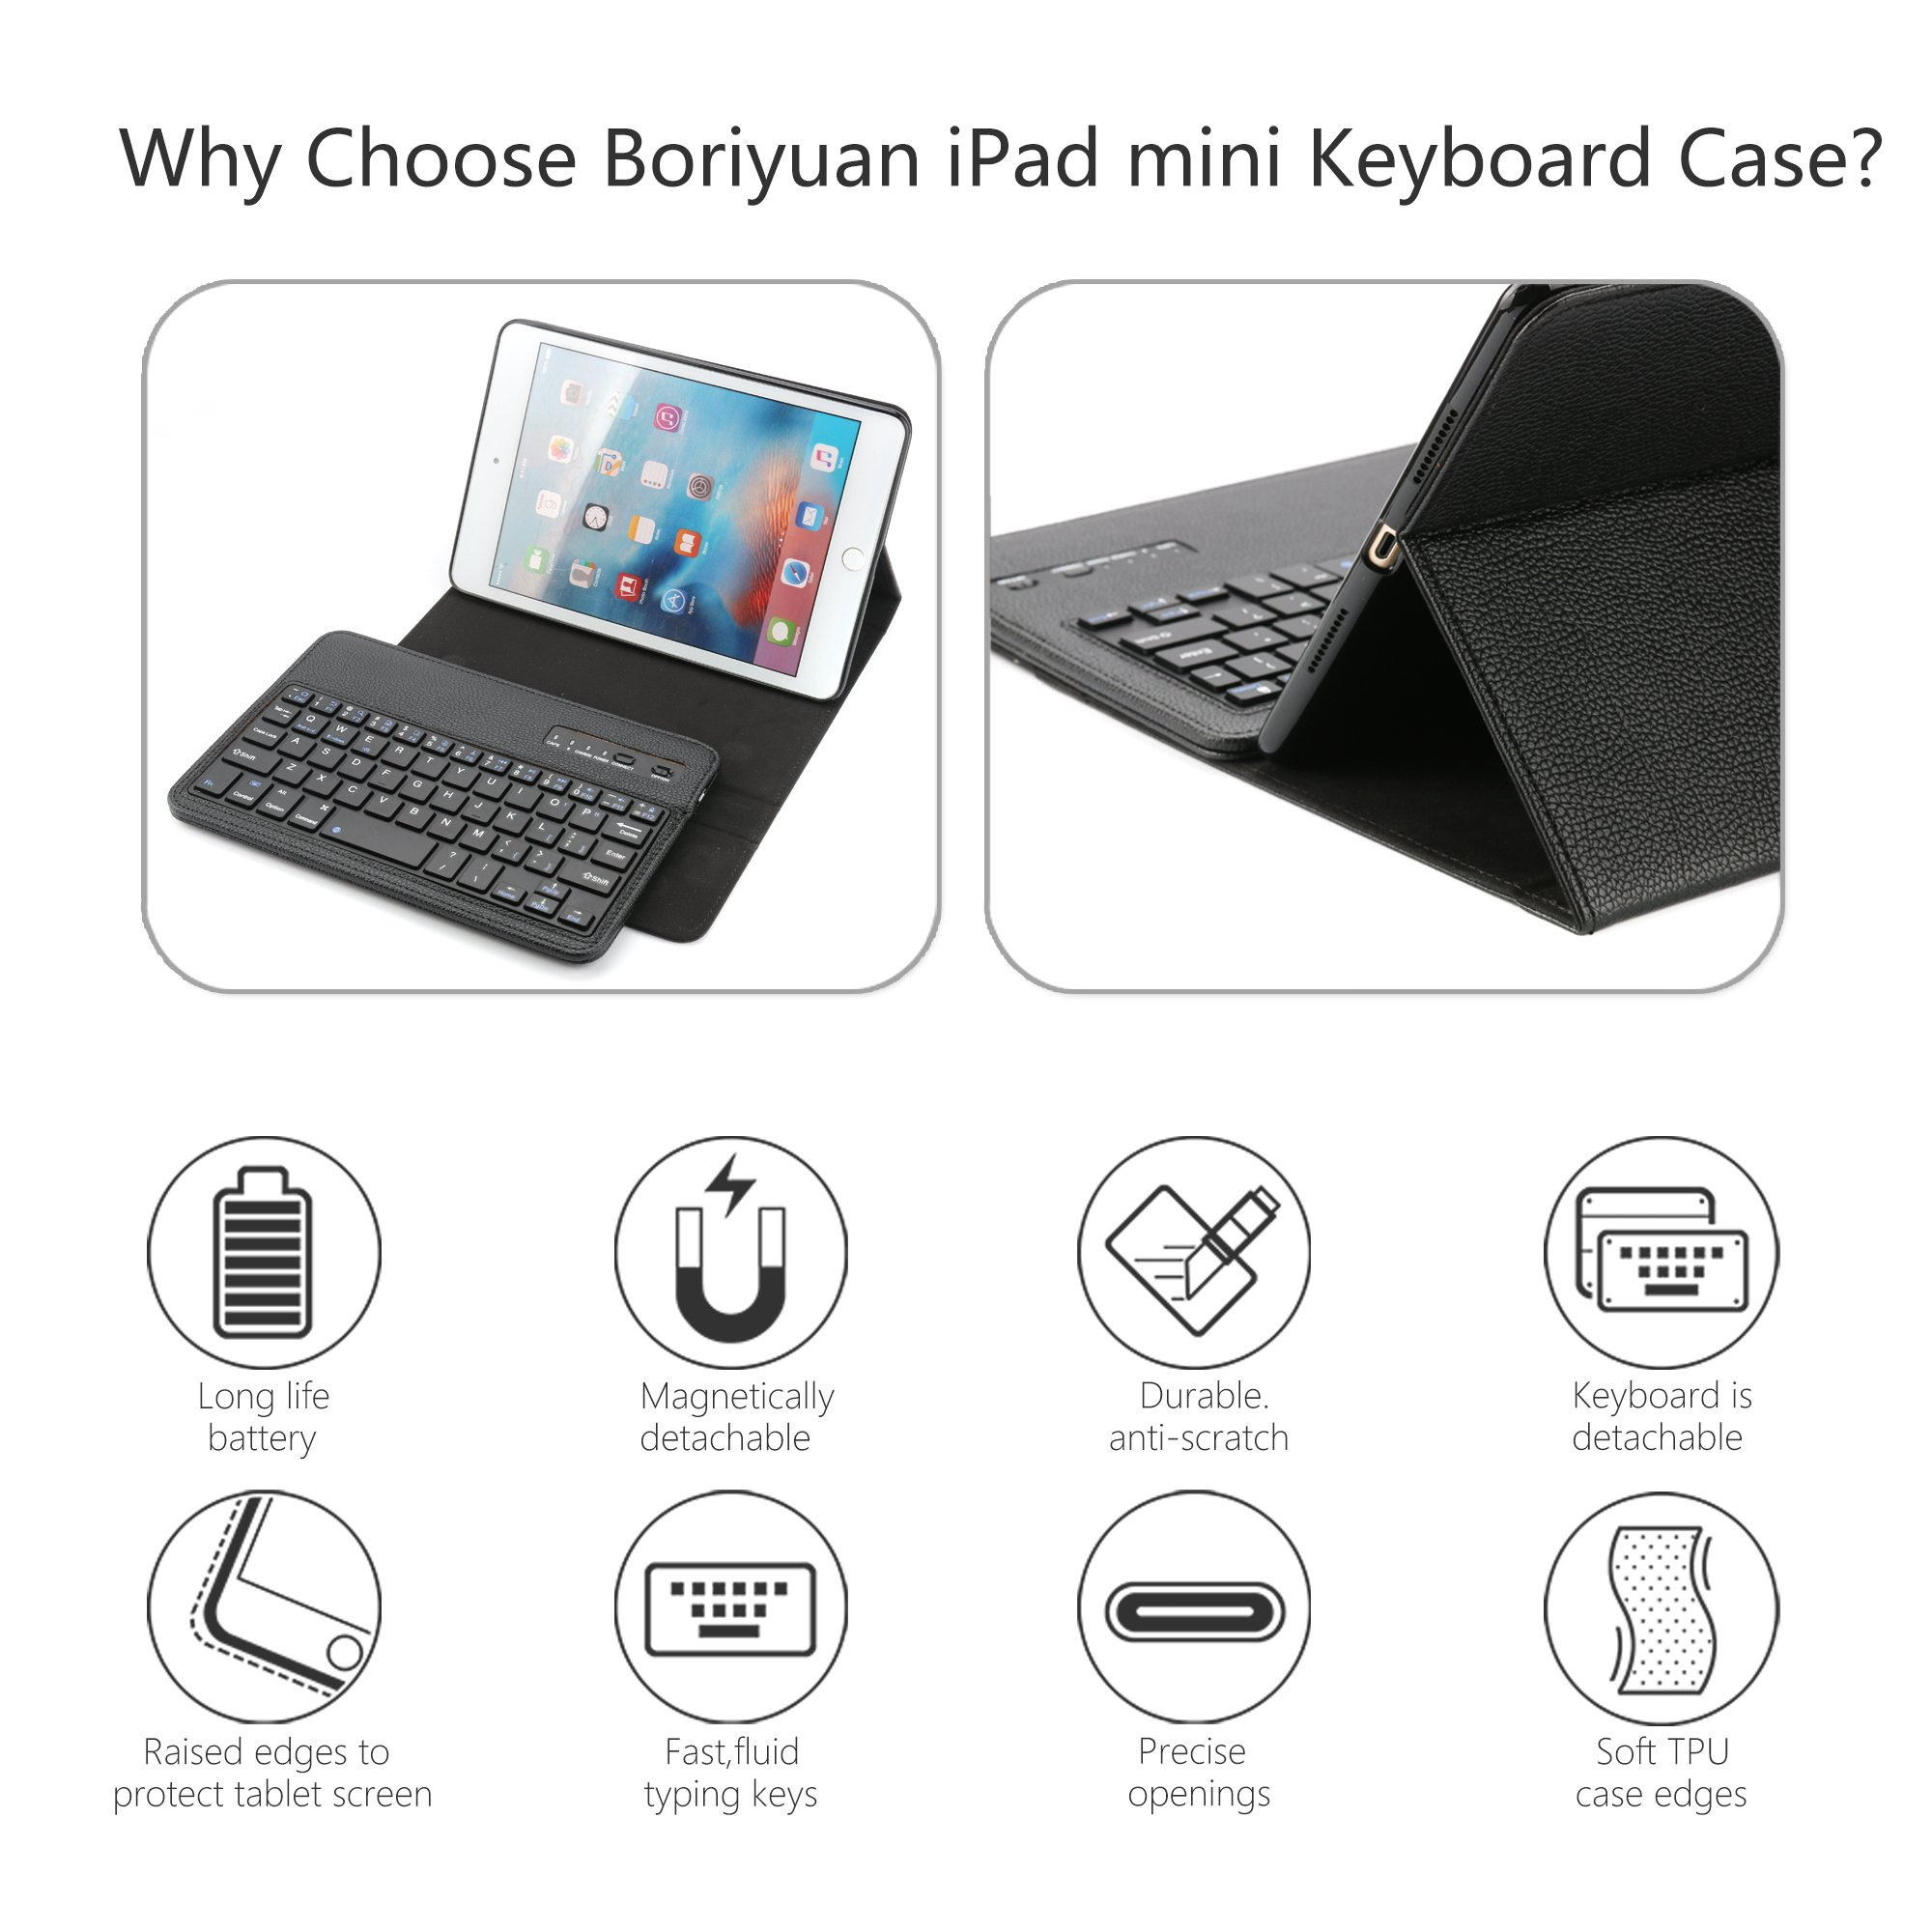 iPad Mini Keyboard Case,Boriyuan iPad Mini Smart Case Stand Folio Leather Cover with Detachable Wireless Bluetooth Keyboard and Screen Protector +Stylus for Apple iPad Mini 1/Mini 2/Mini 3 (Black) by Boriyuan (Image #2)